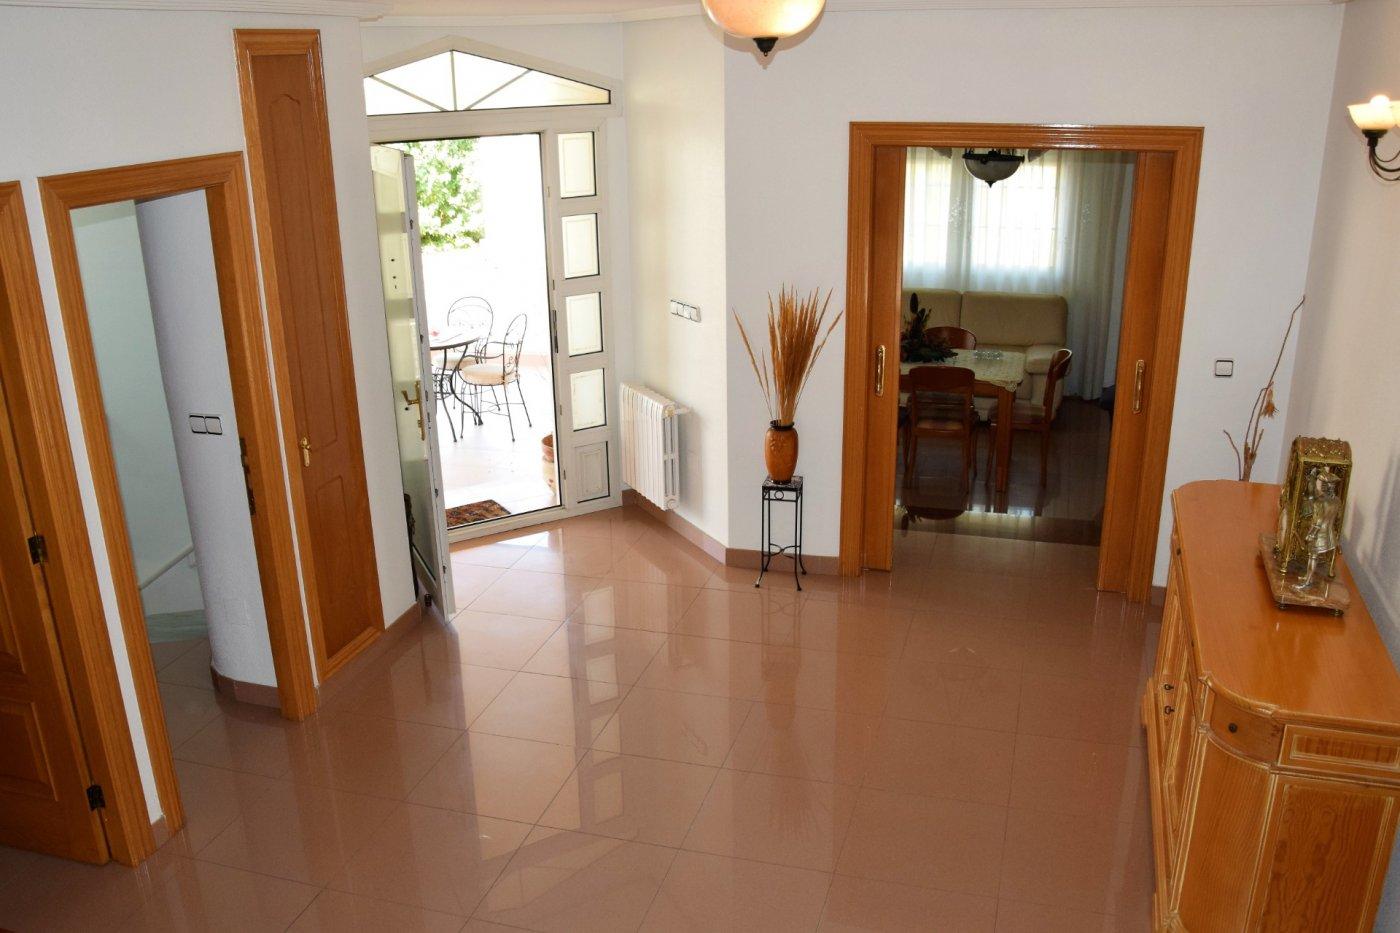 Chalet en Murcia www.joaquincarceles.com JC174 (19)